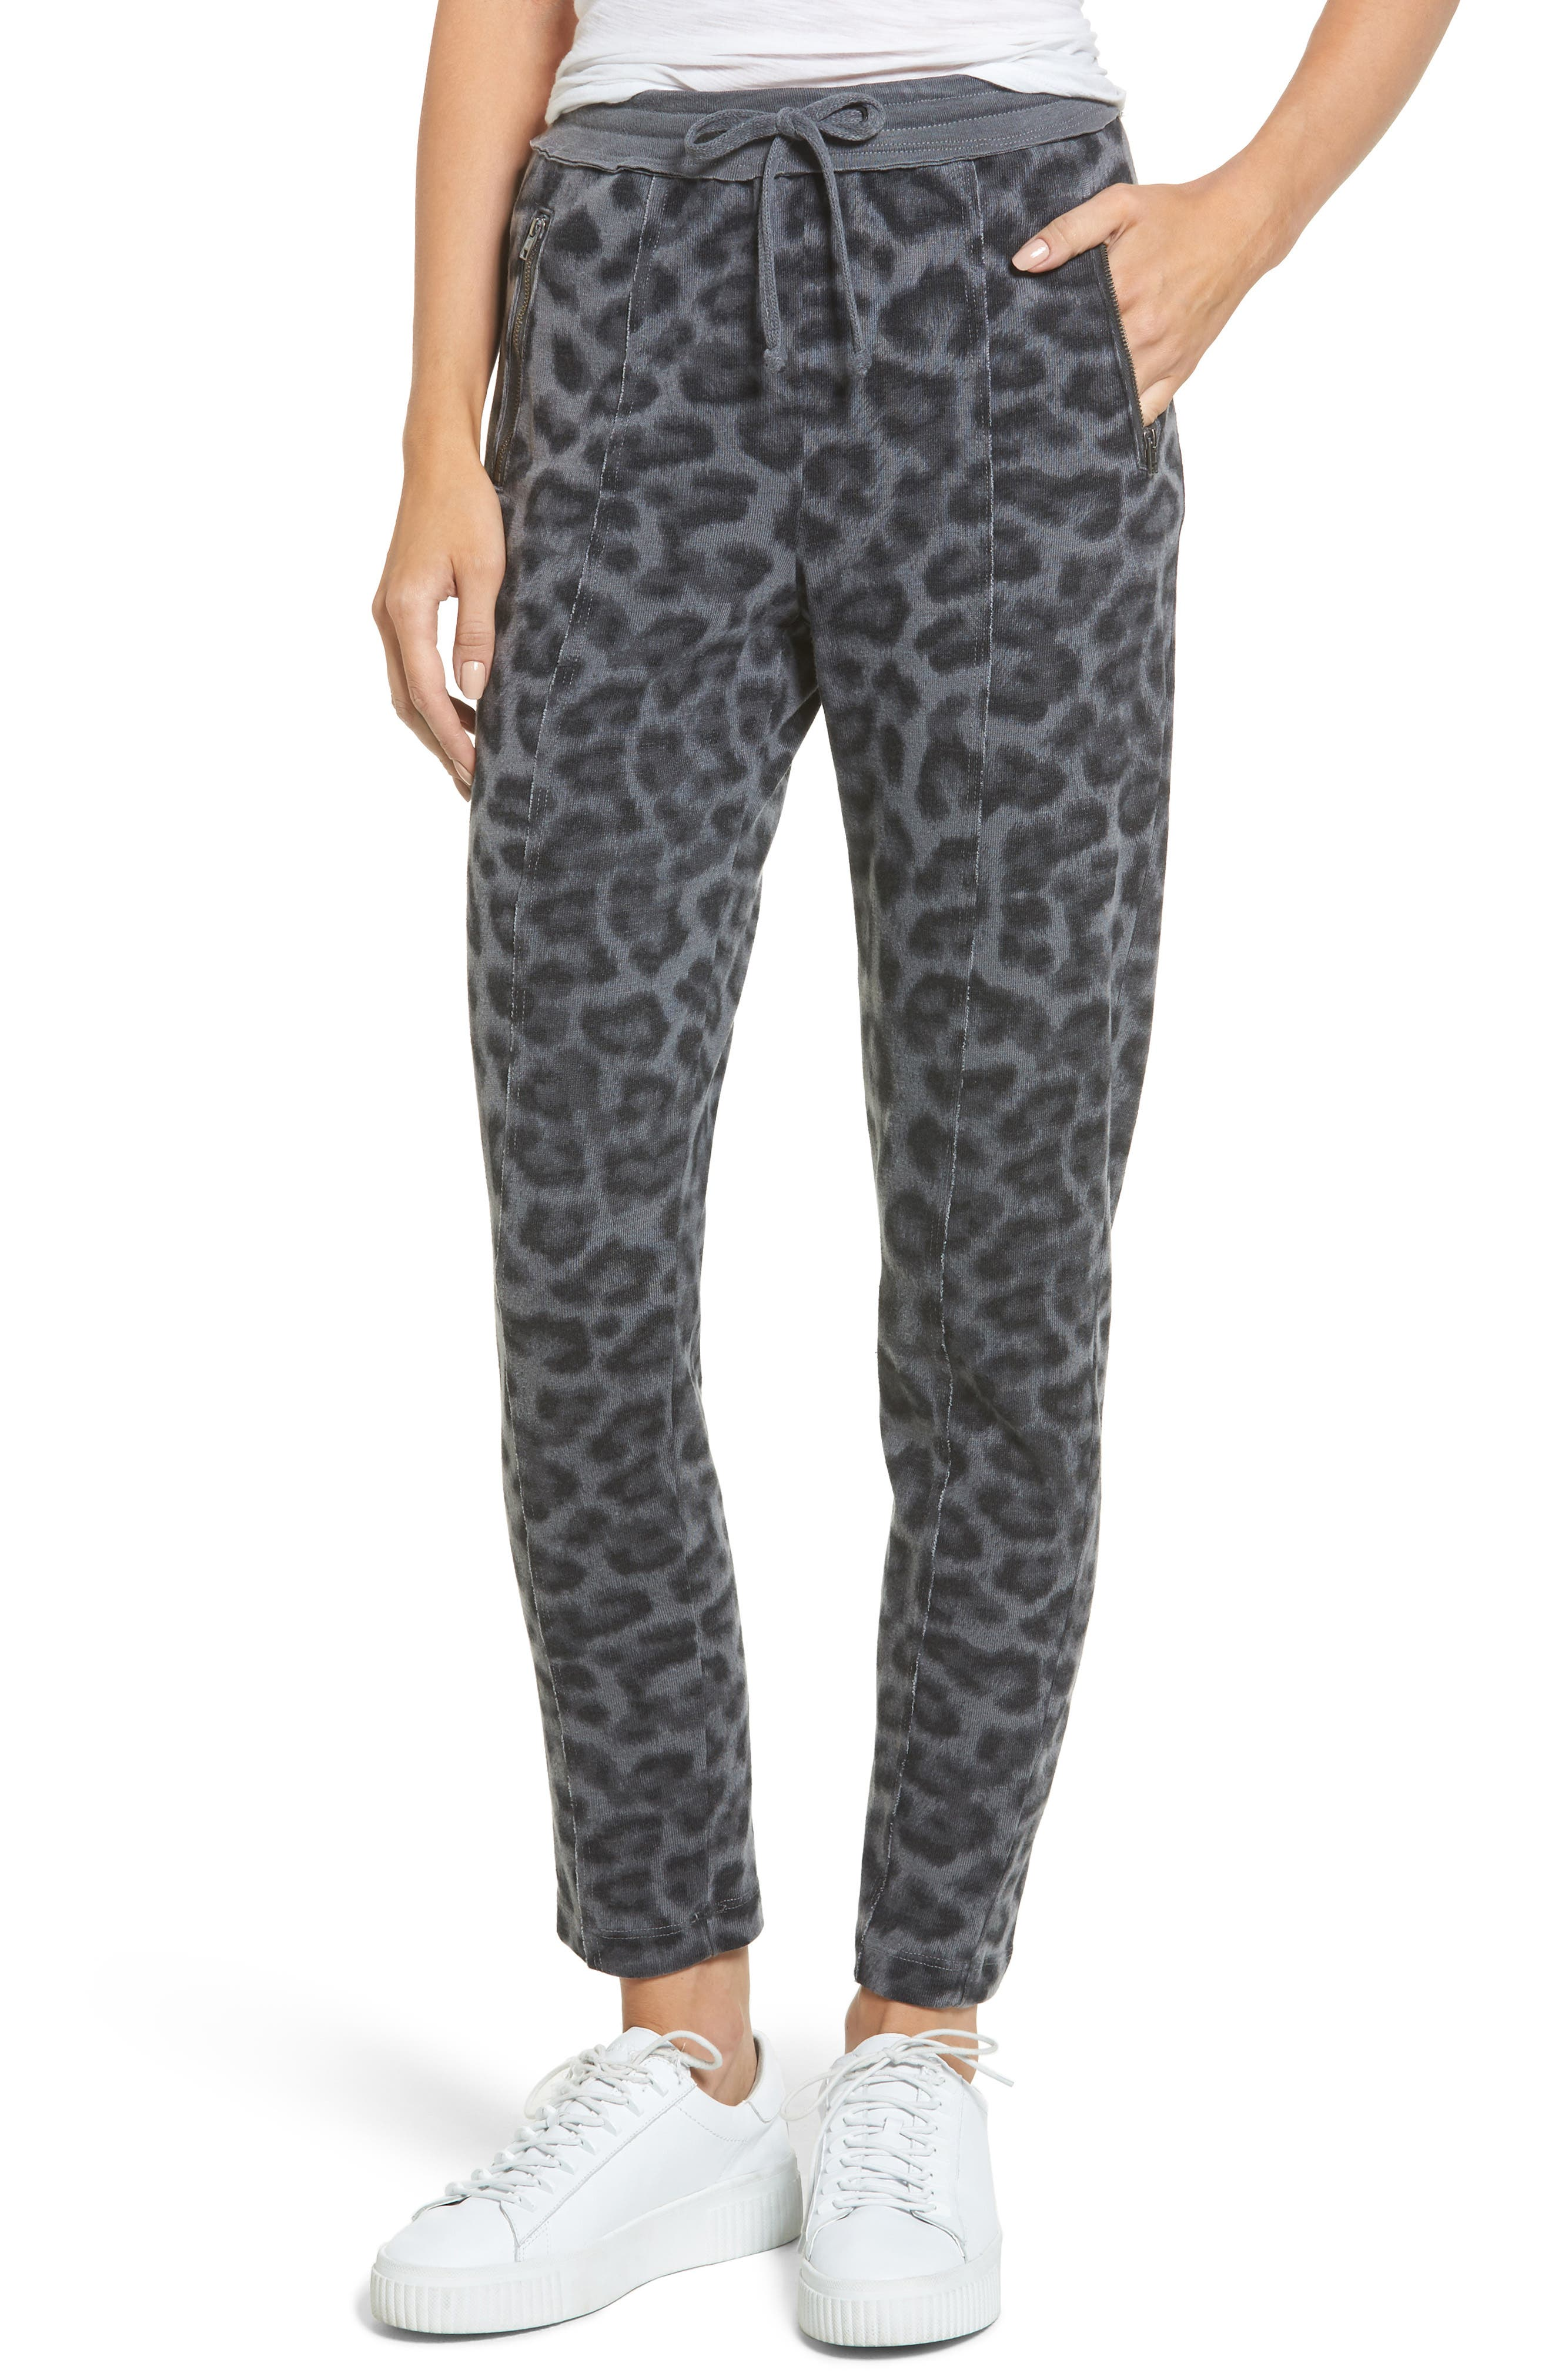 Leopard Print Jogger Pants,                         Main,                         color, 032